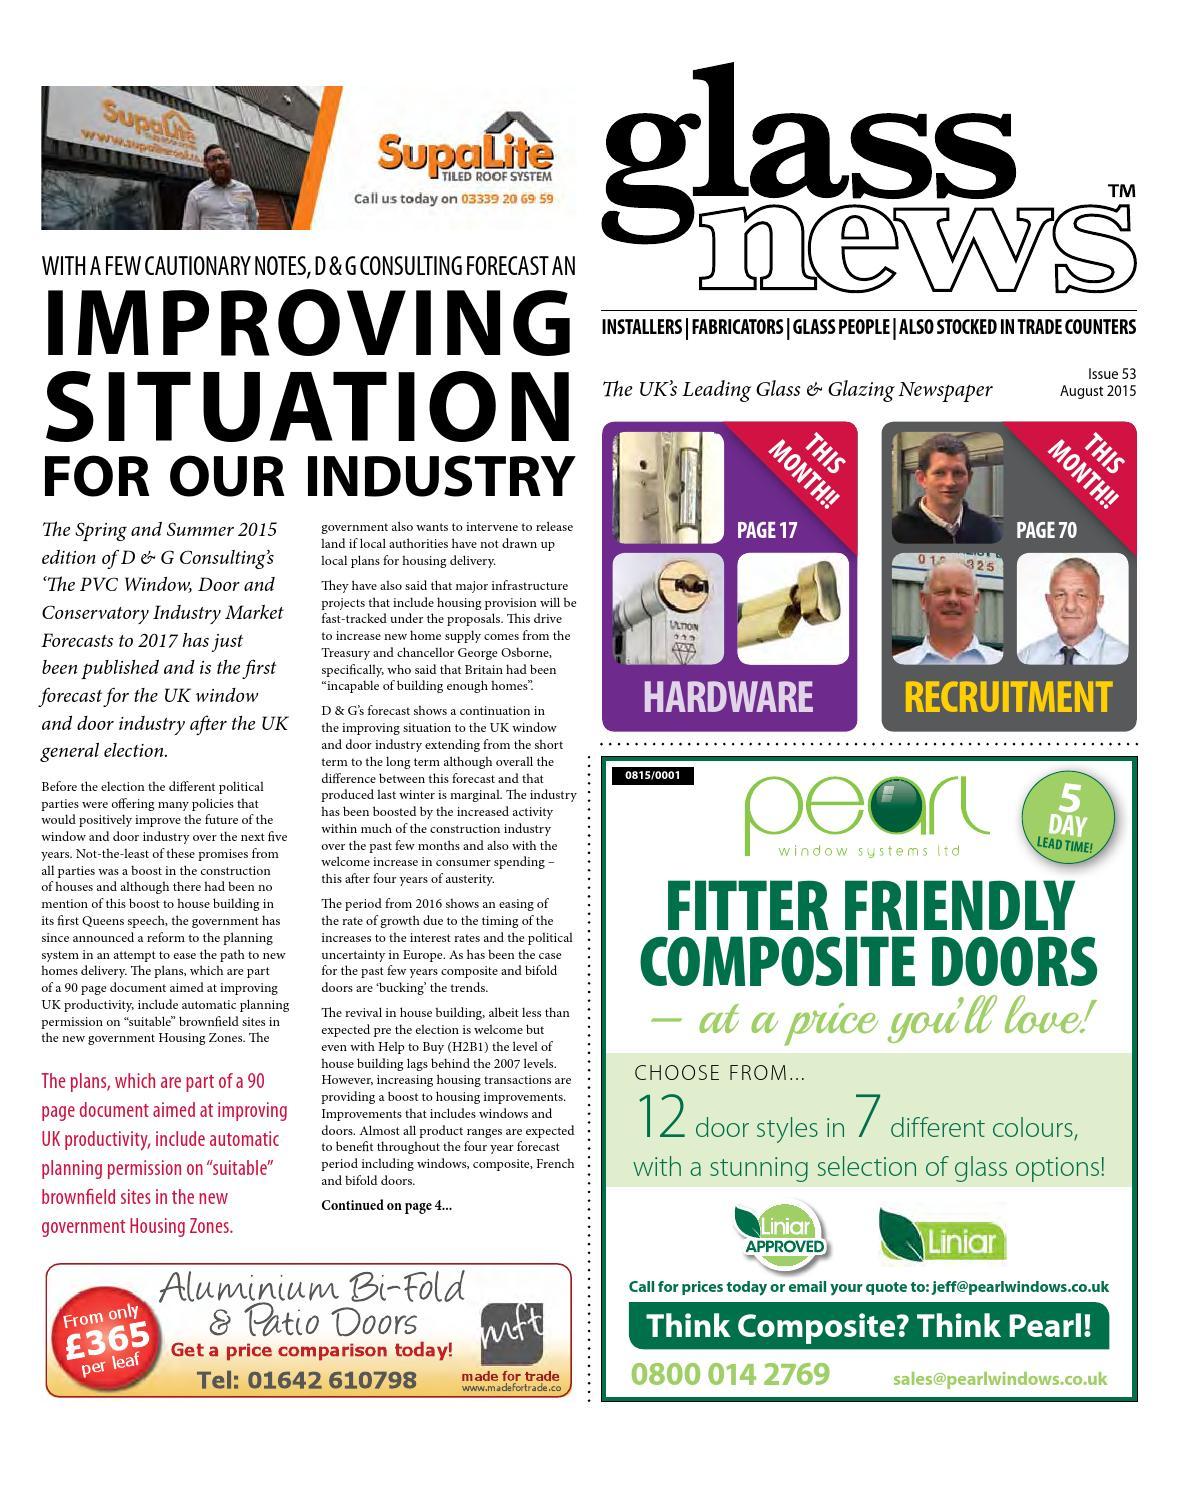 Glass News August 2015 by Christina Shaw - issuu